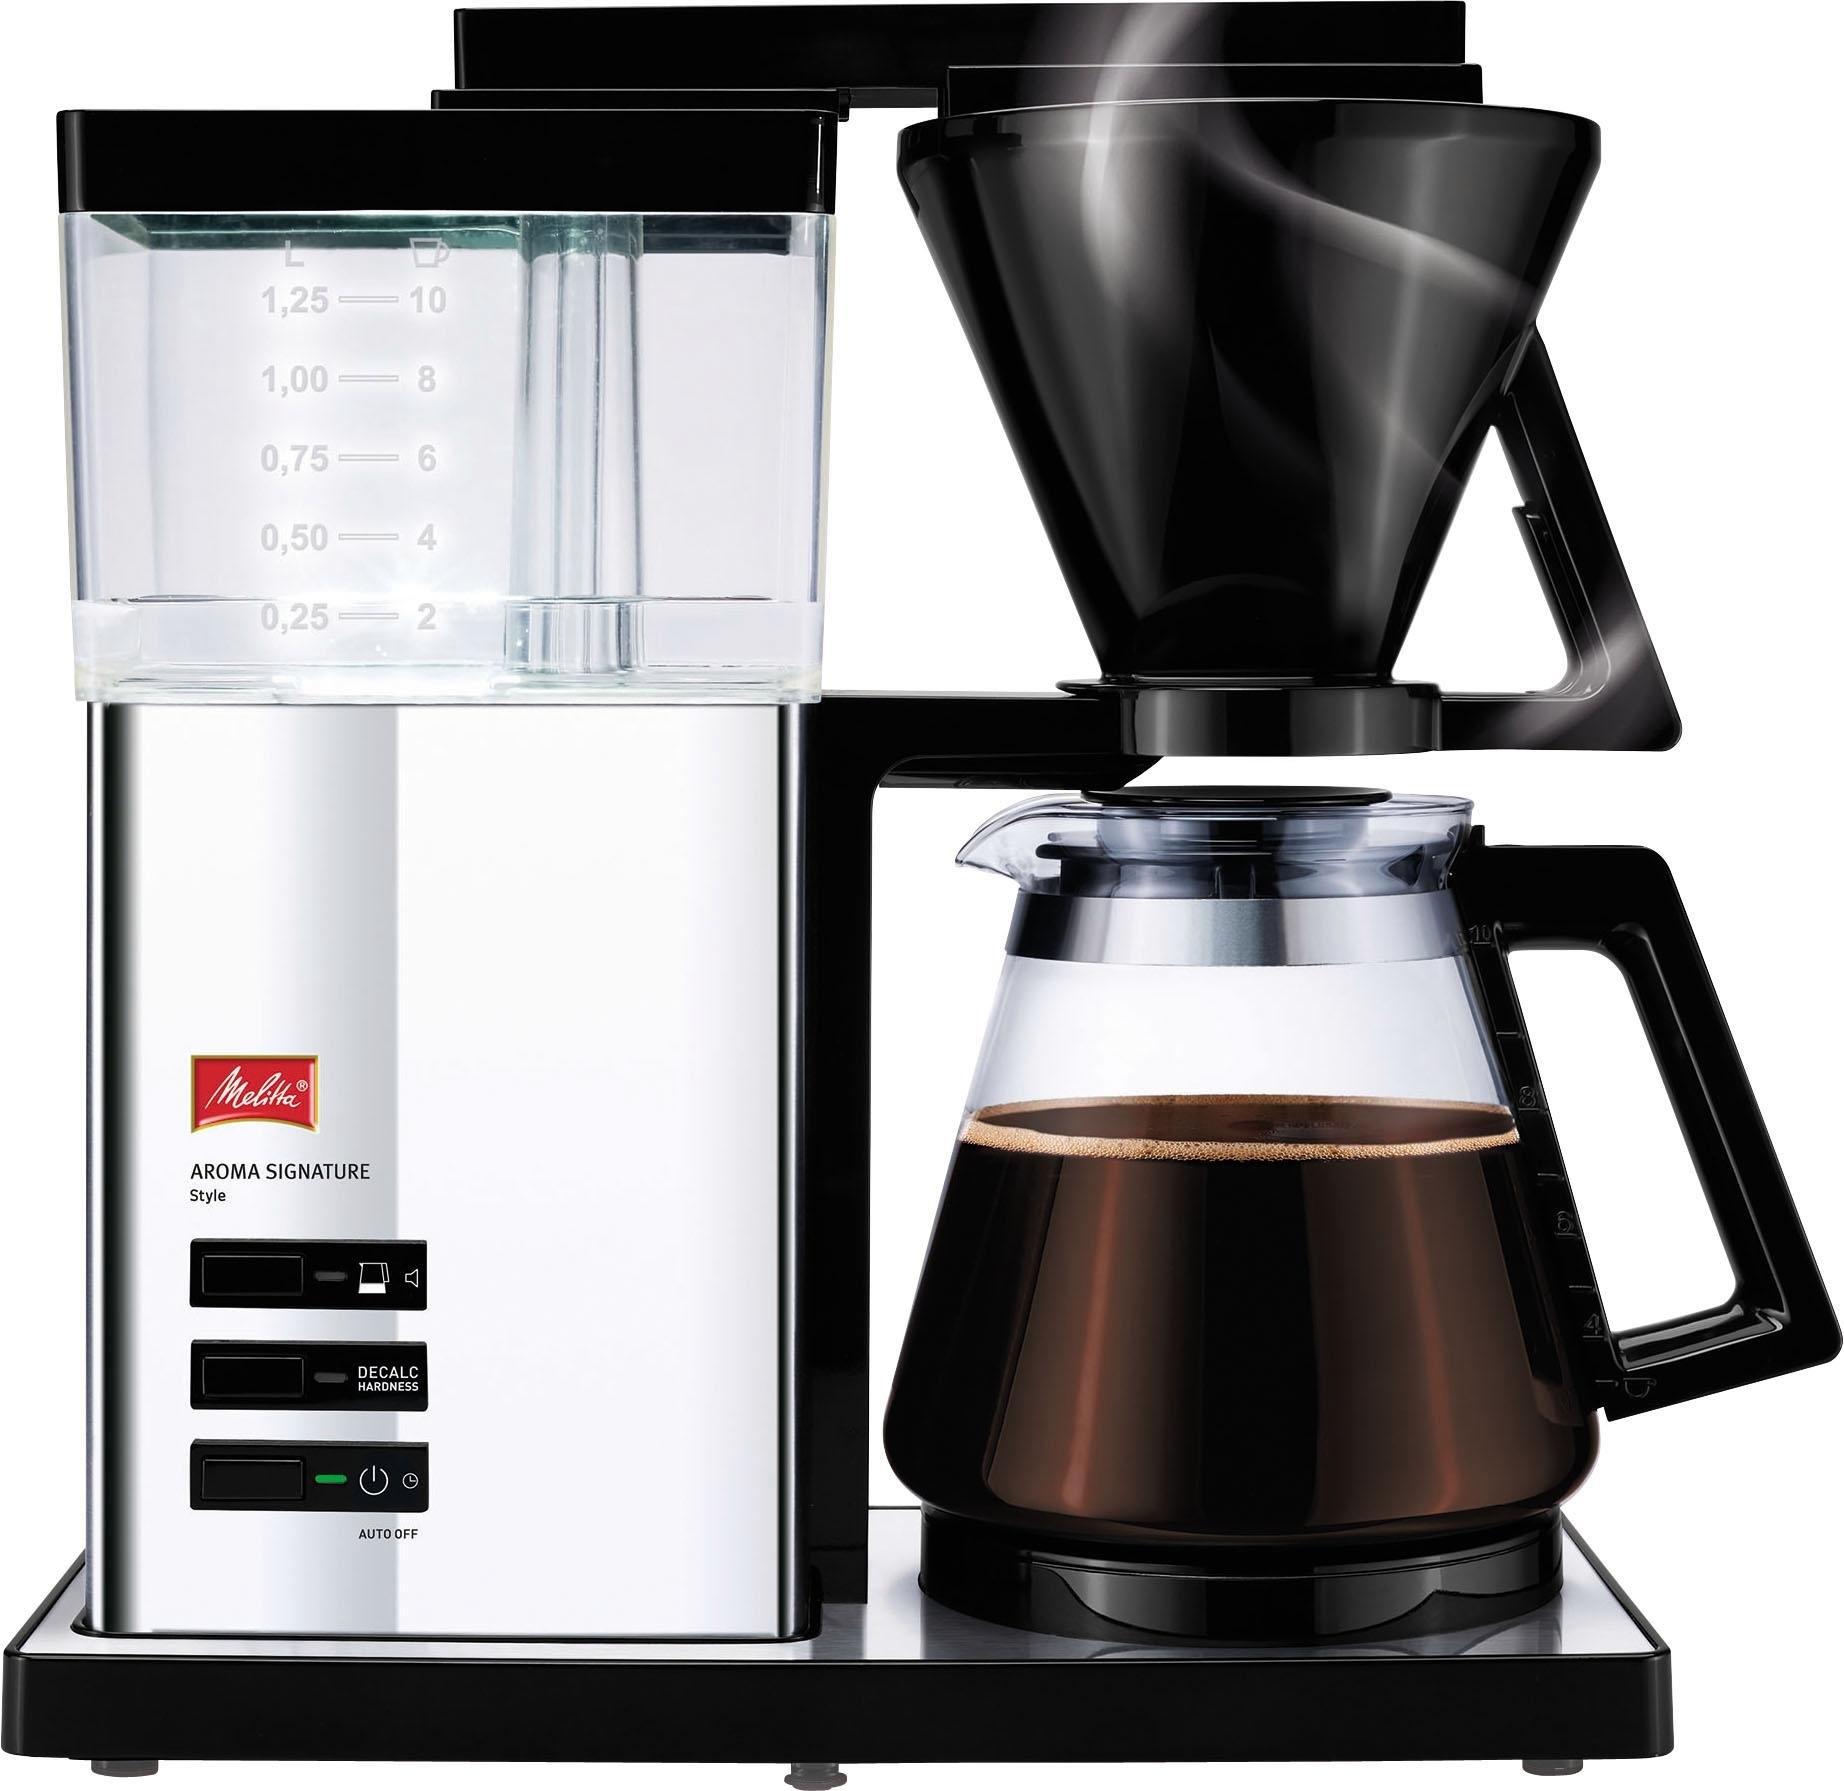 Melitta filterkoffiezetapparaat Aroma Signature Deluxe 100702, koffiekan 1,2 l, papieren filter 1x4 veilig op otto.nl kopen